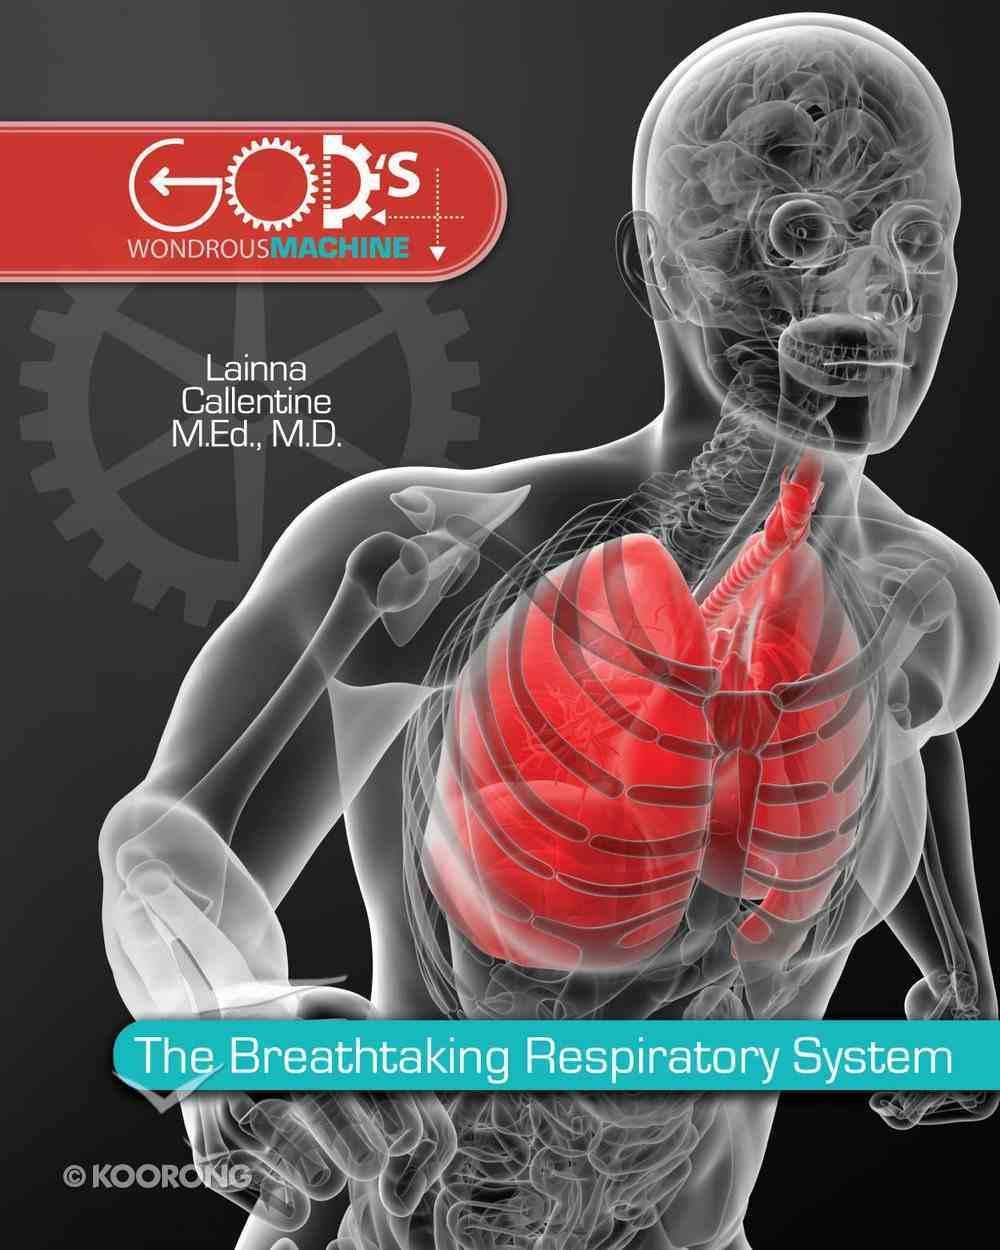 Breathtaking Respiratory System (God's Wondrous Machine Series) eBook